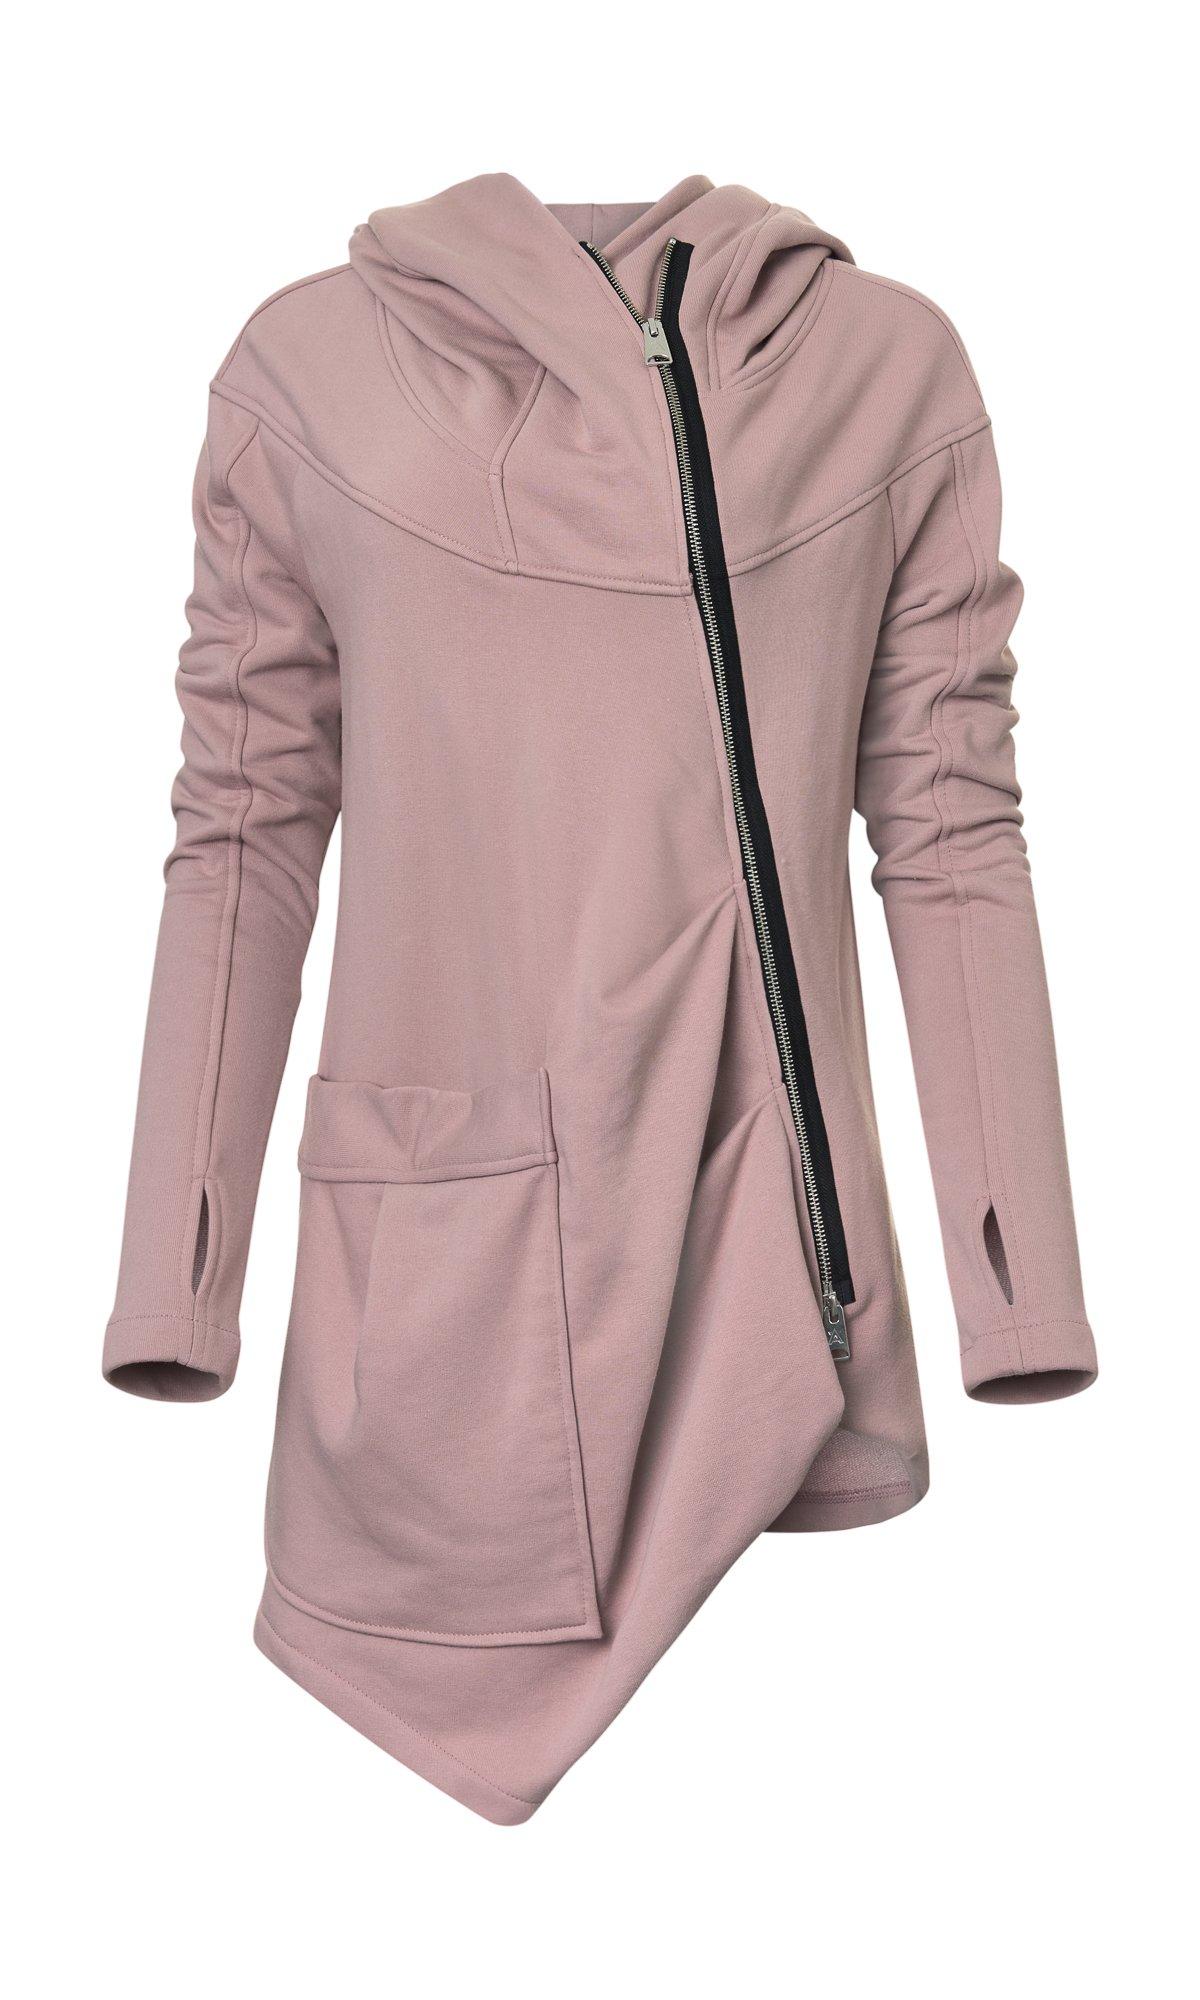 Light Asymmetric Hooded Sweatshirt